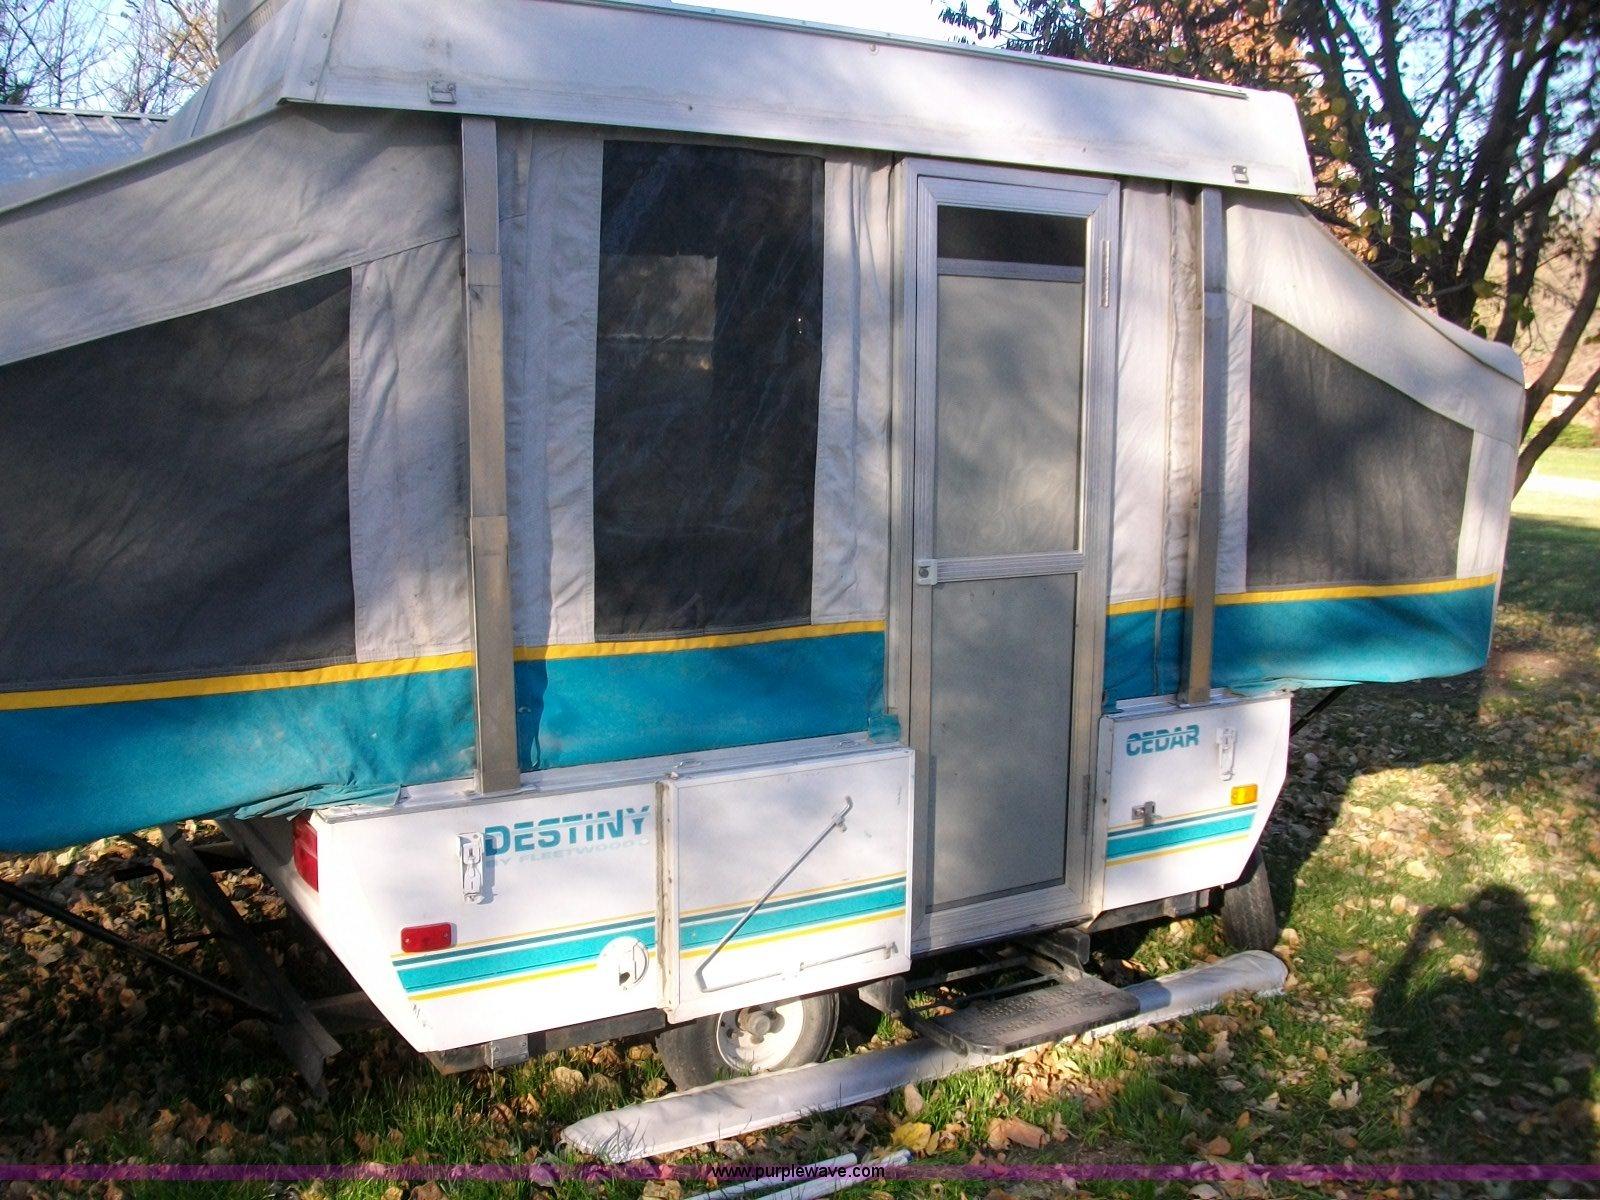 1994 Fleetwood Cedar Coleman Destiny Camper Item 1560 So Wiring Diagram Full Size In New Window